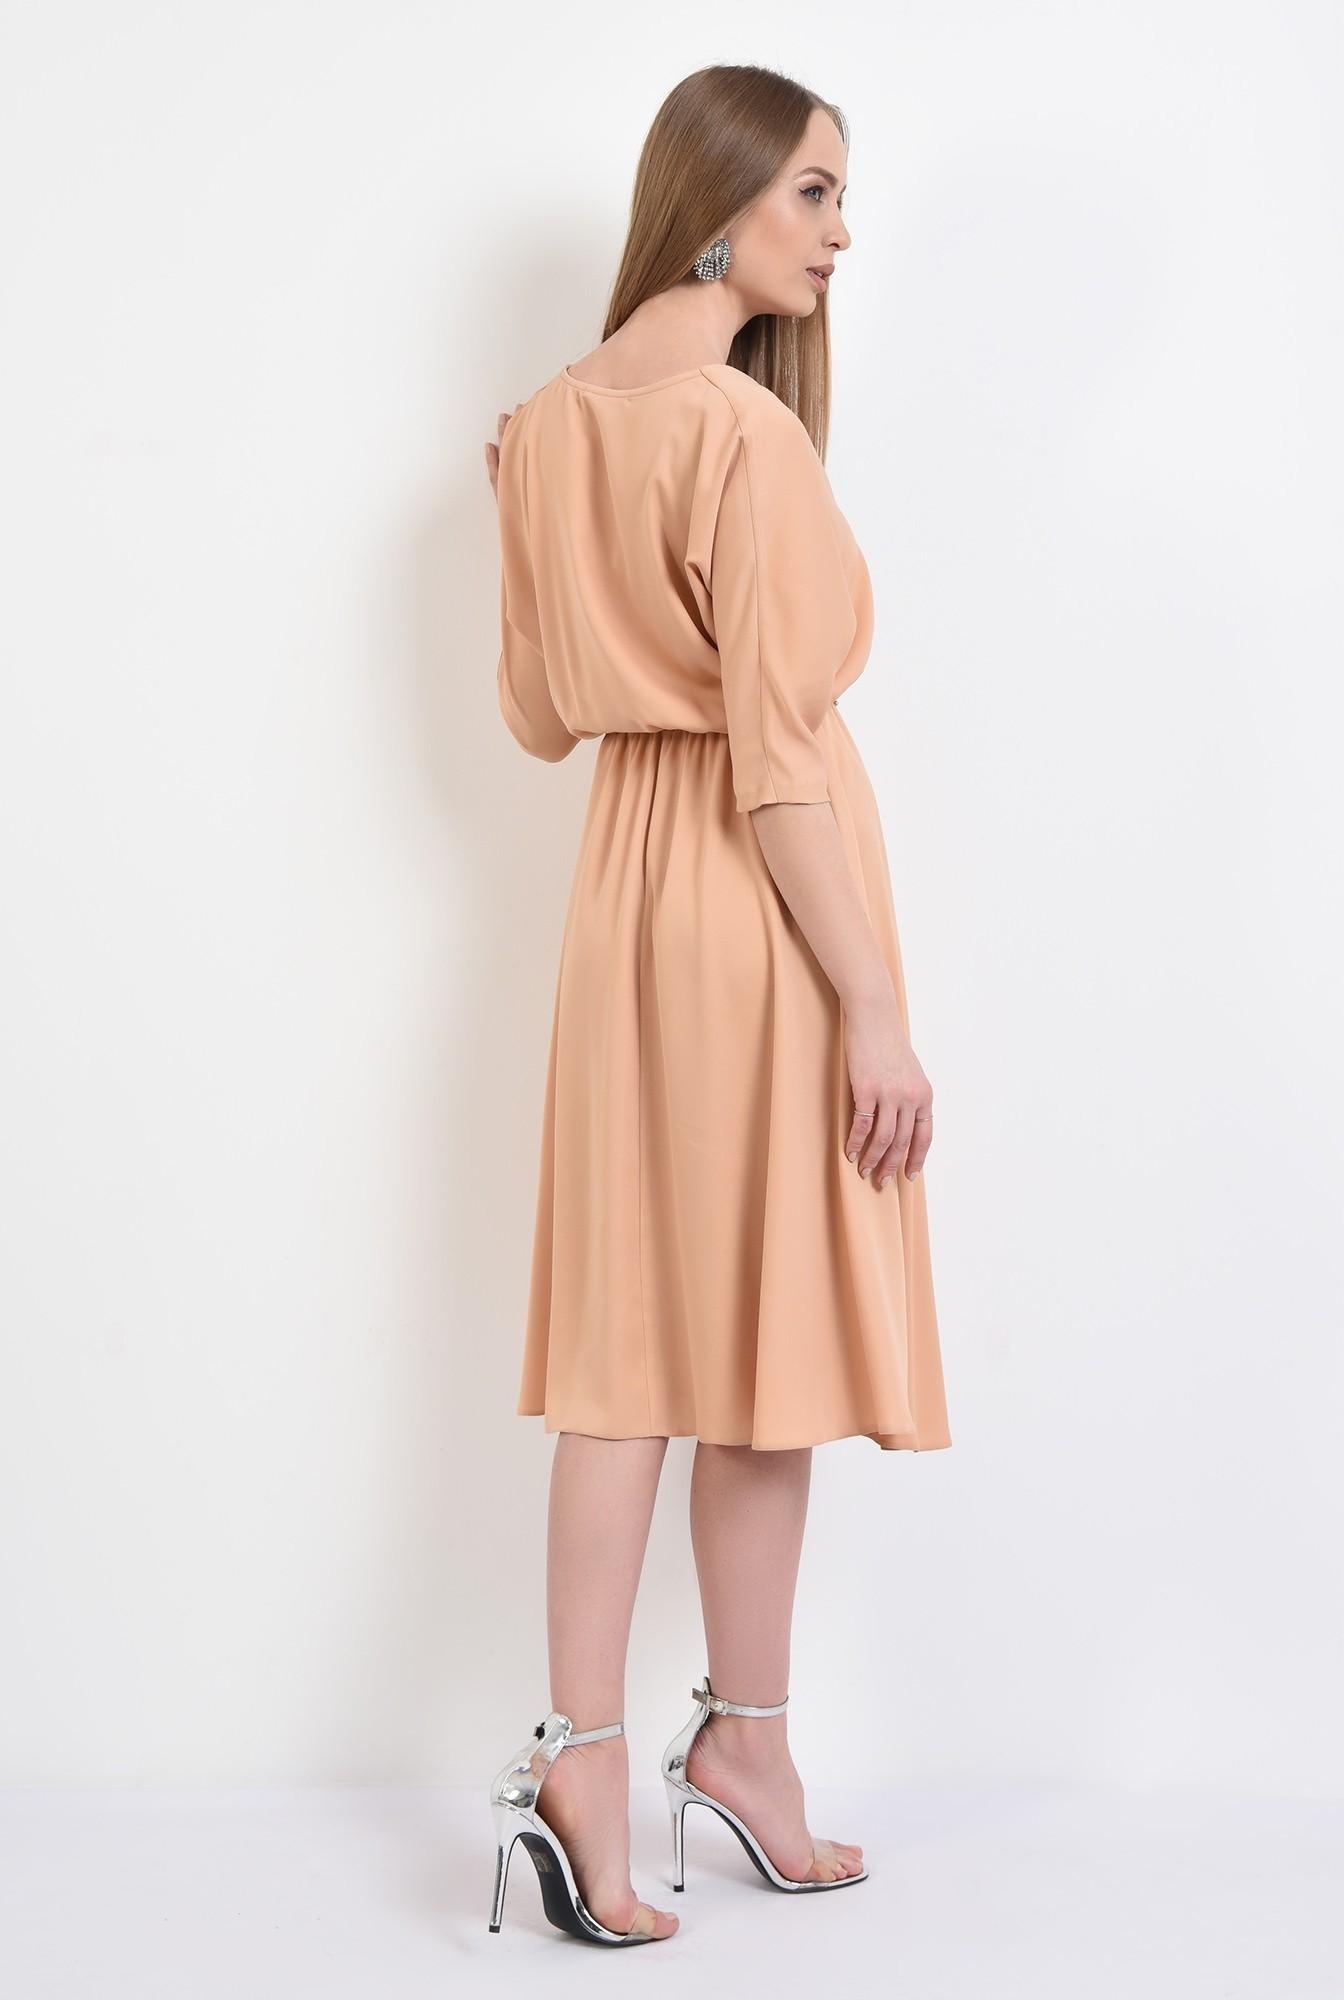 1 -  rochie eleganta, evazata, maneci liliac, croi clos, cu anchior, Poema